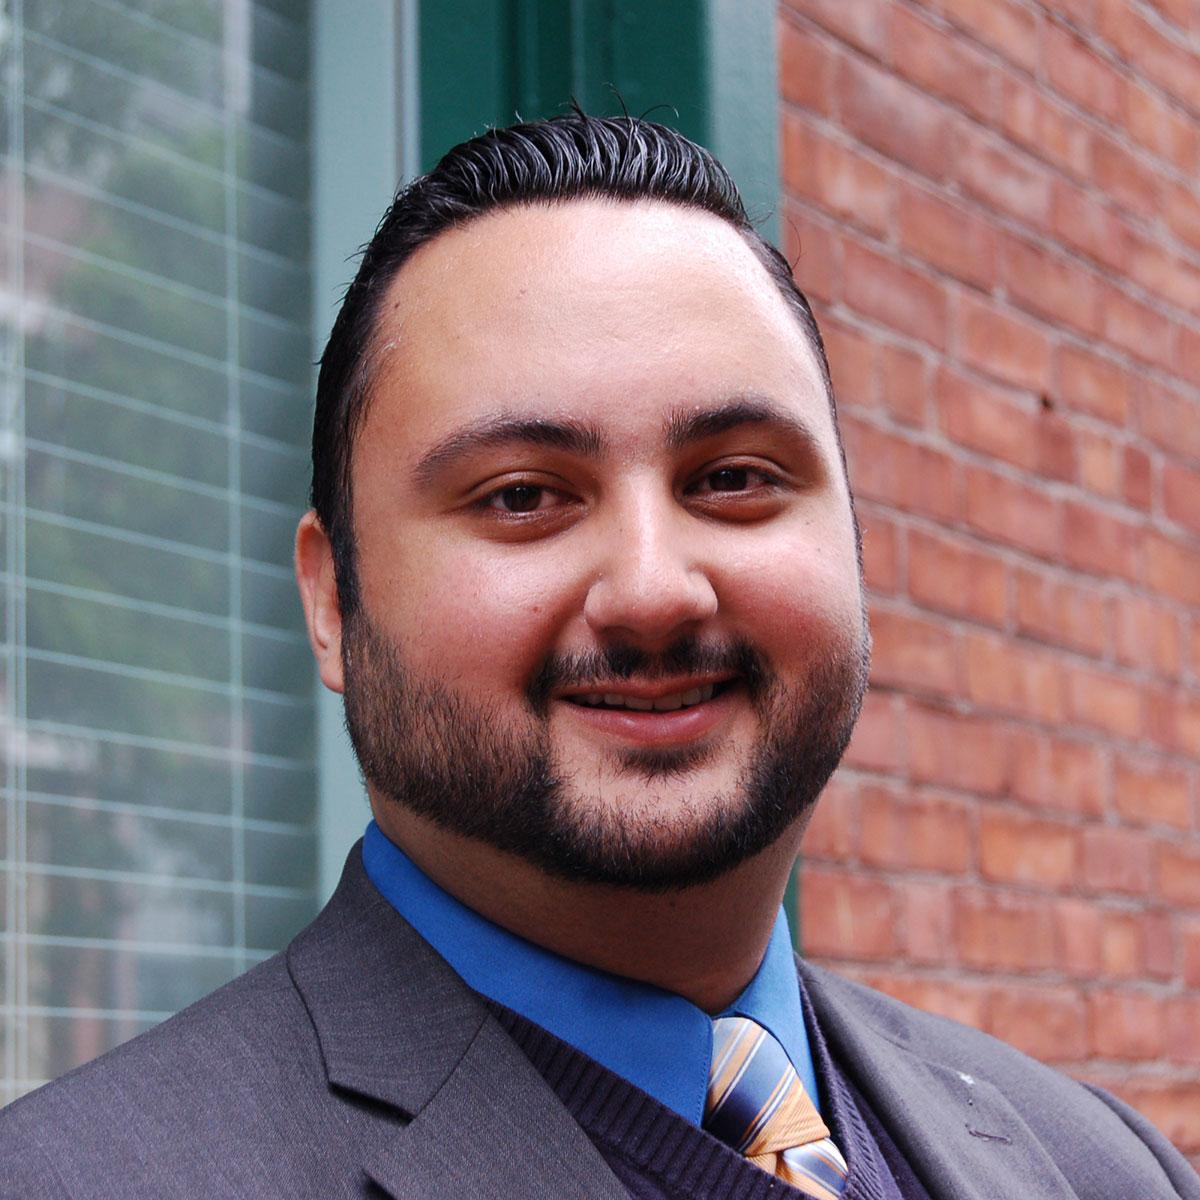 Gain legal advice through New England Law | Boston's mentorship programs